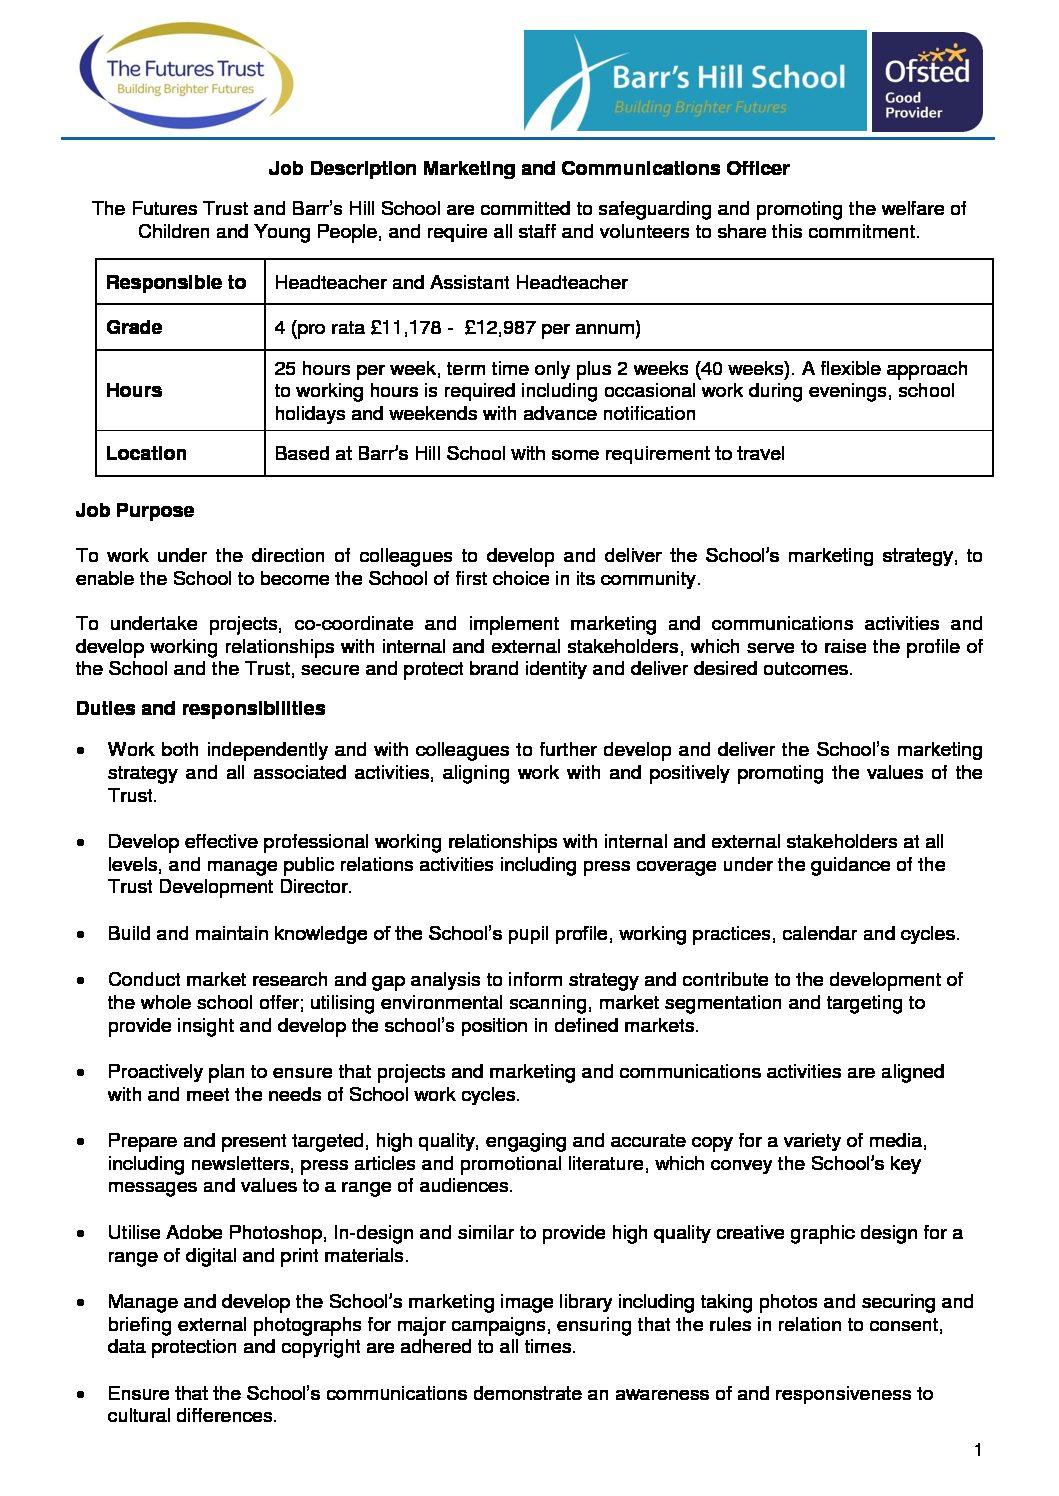 Job Description Marketing and Communications Officer - Barr's Hill School